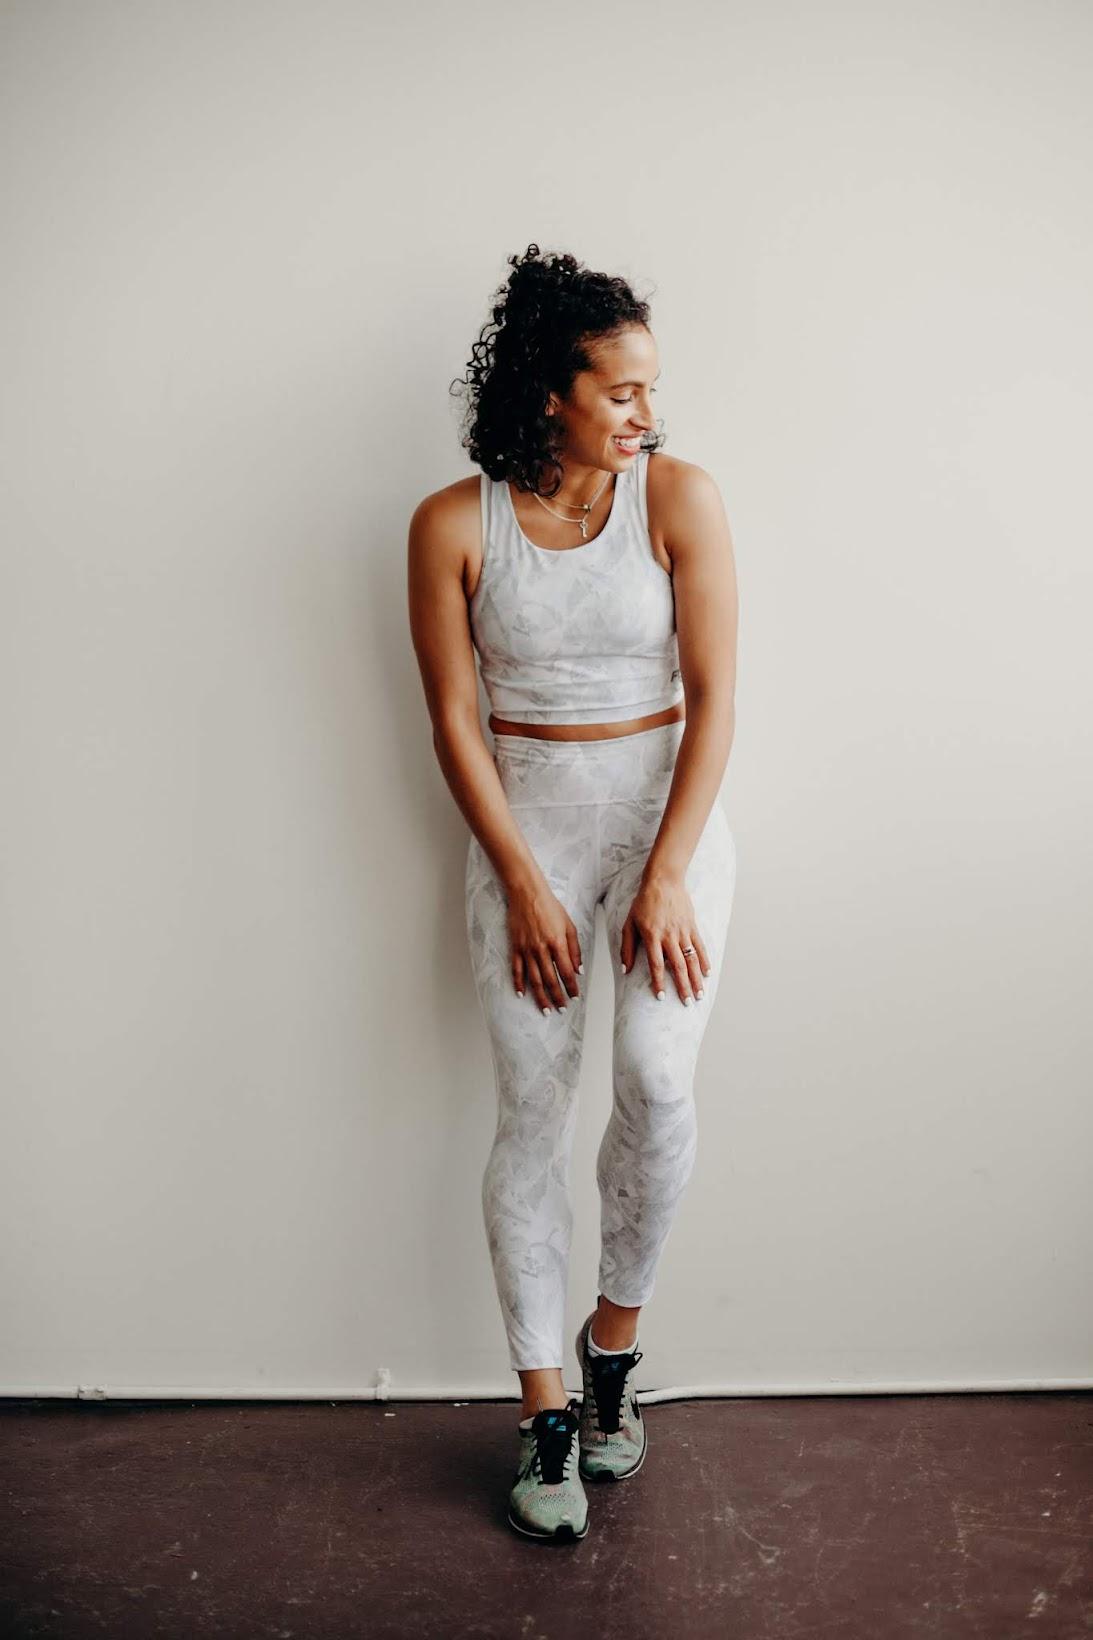 body image, body positivity, flywheel, workout gear, short curly hair